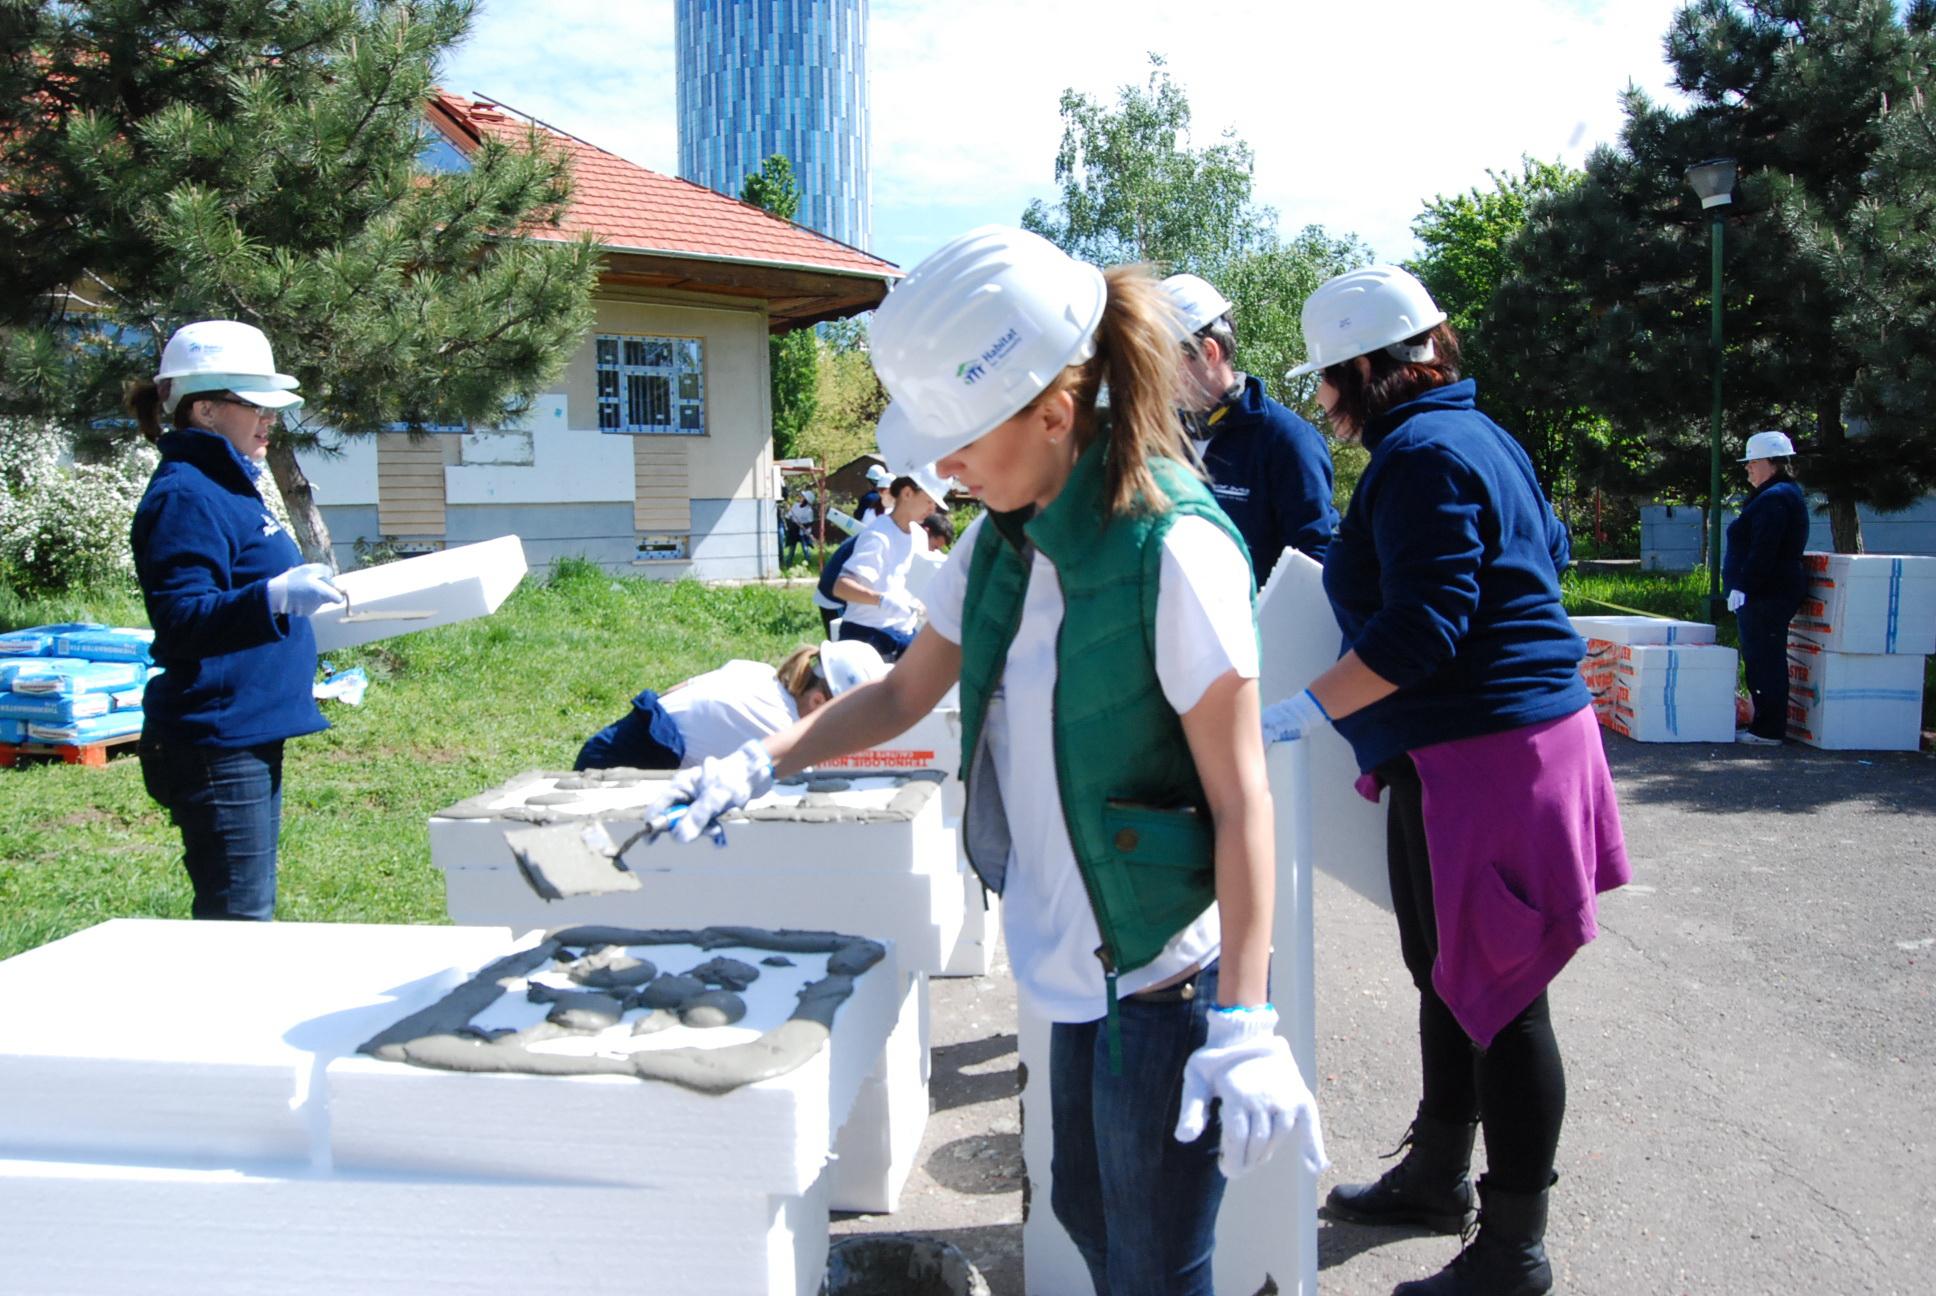 (P) GDF SUEZ Energy Romania incurajeaza angajatii sa faca voluntariat